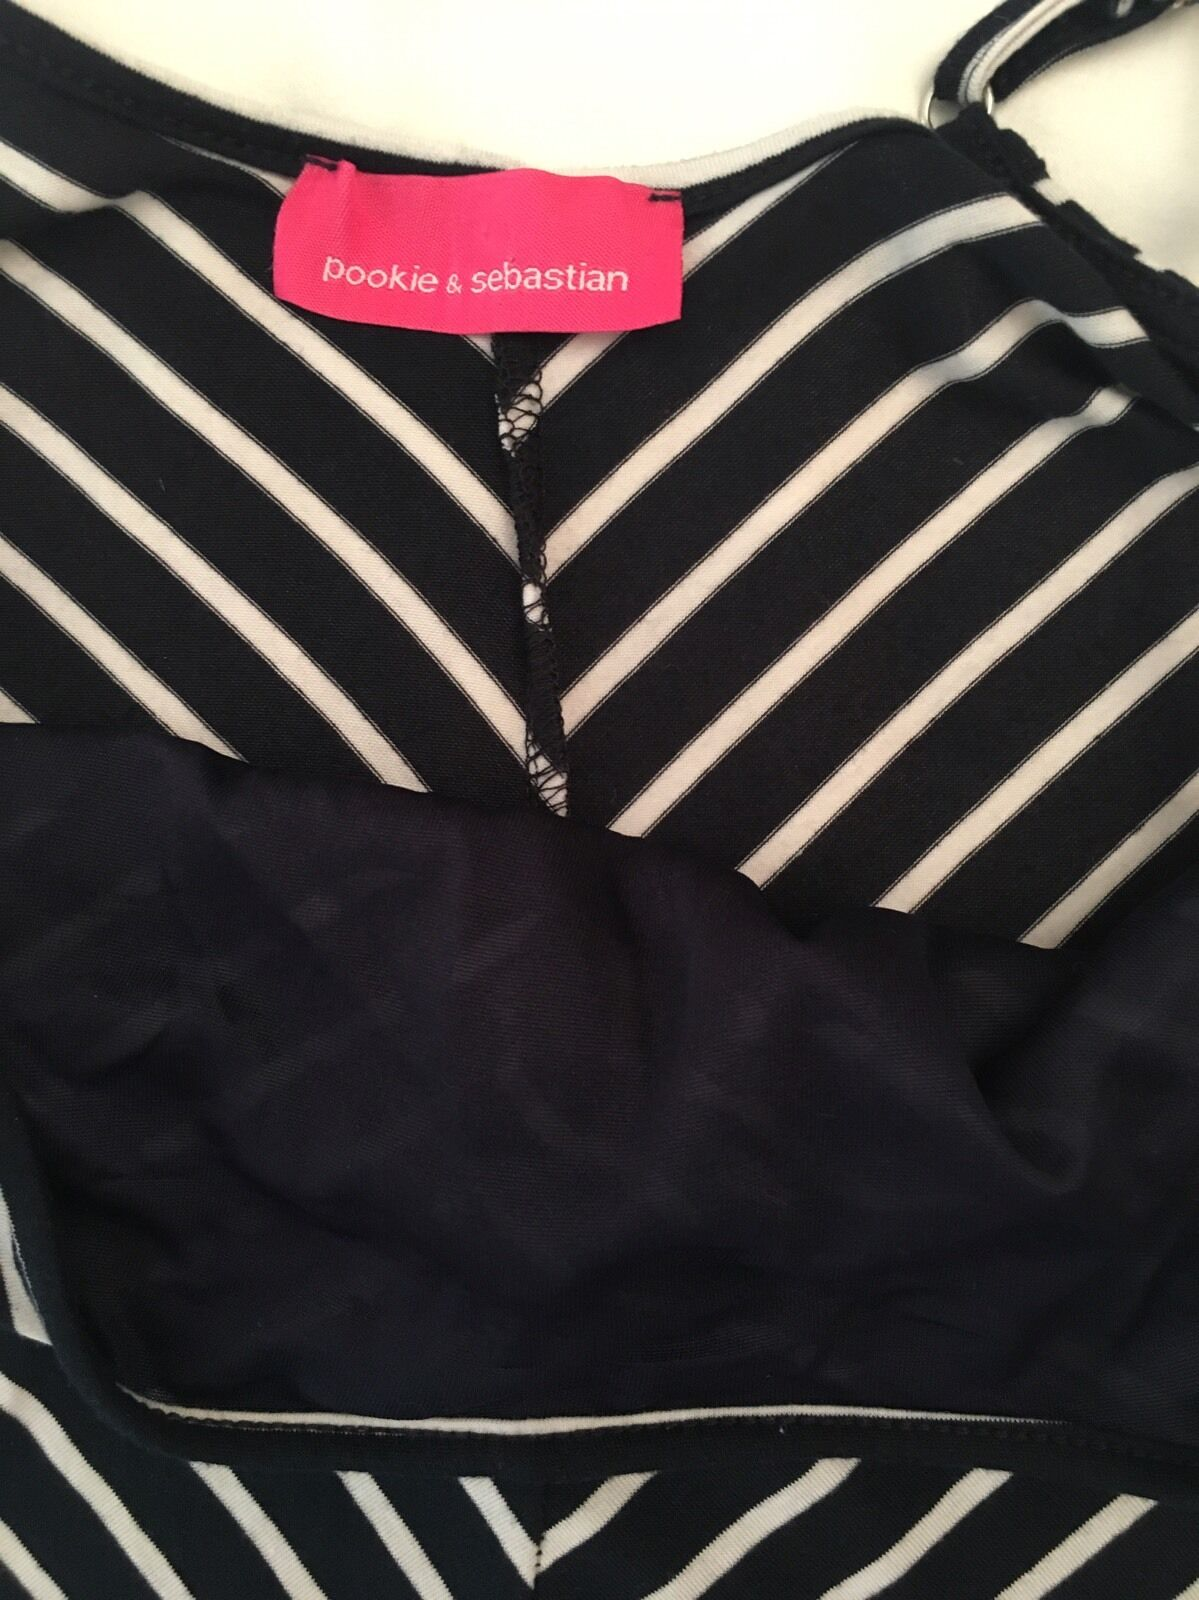 Pookie & Sebastian bluee bluee bluee & White Striped Full-length Spaghetti Straps Dress Sz S e6f38e